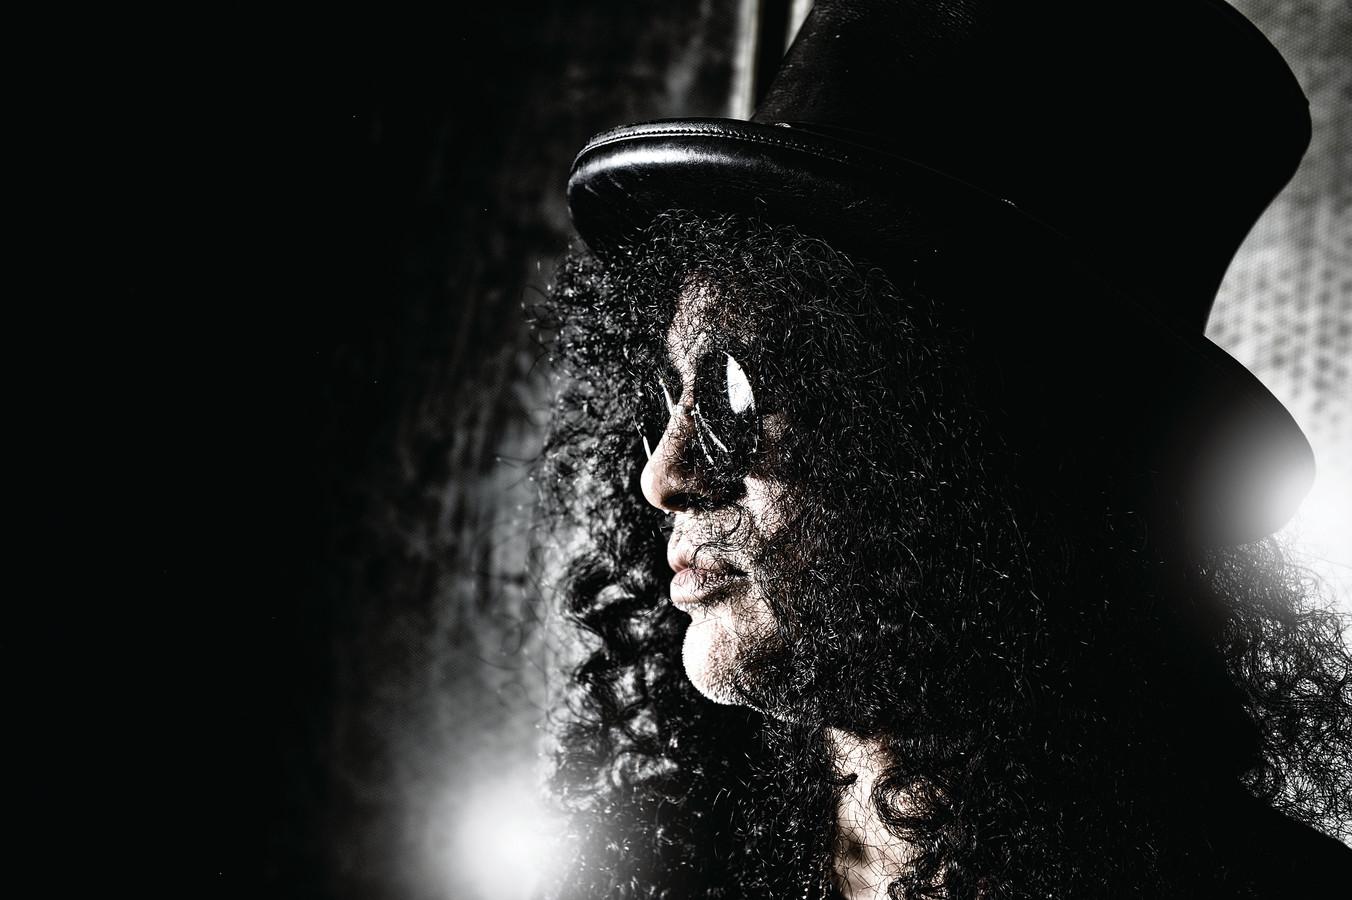 Een portret van Guns n Roses-gitarist Slash.